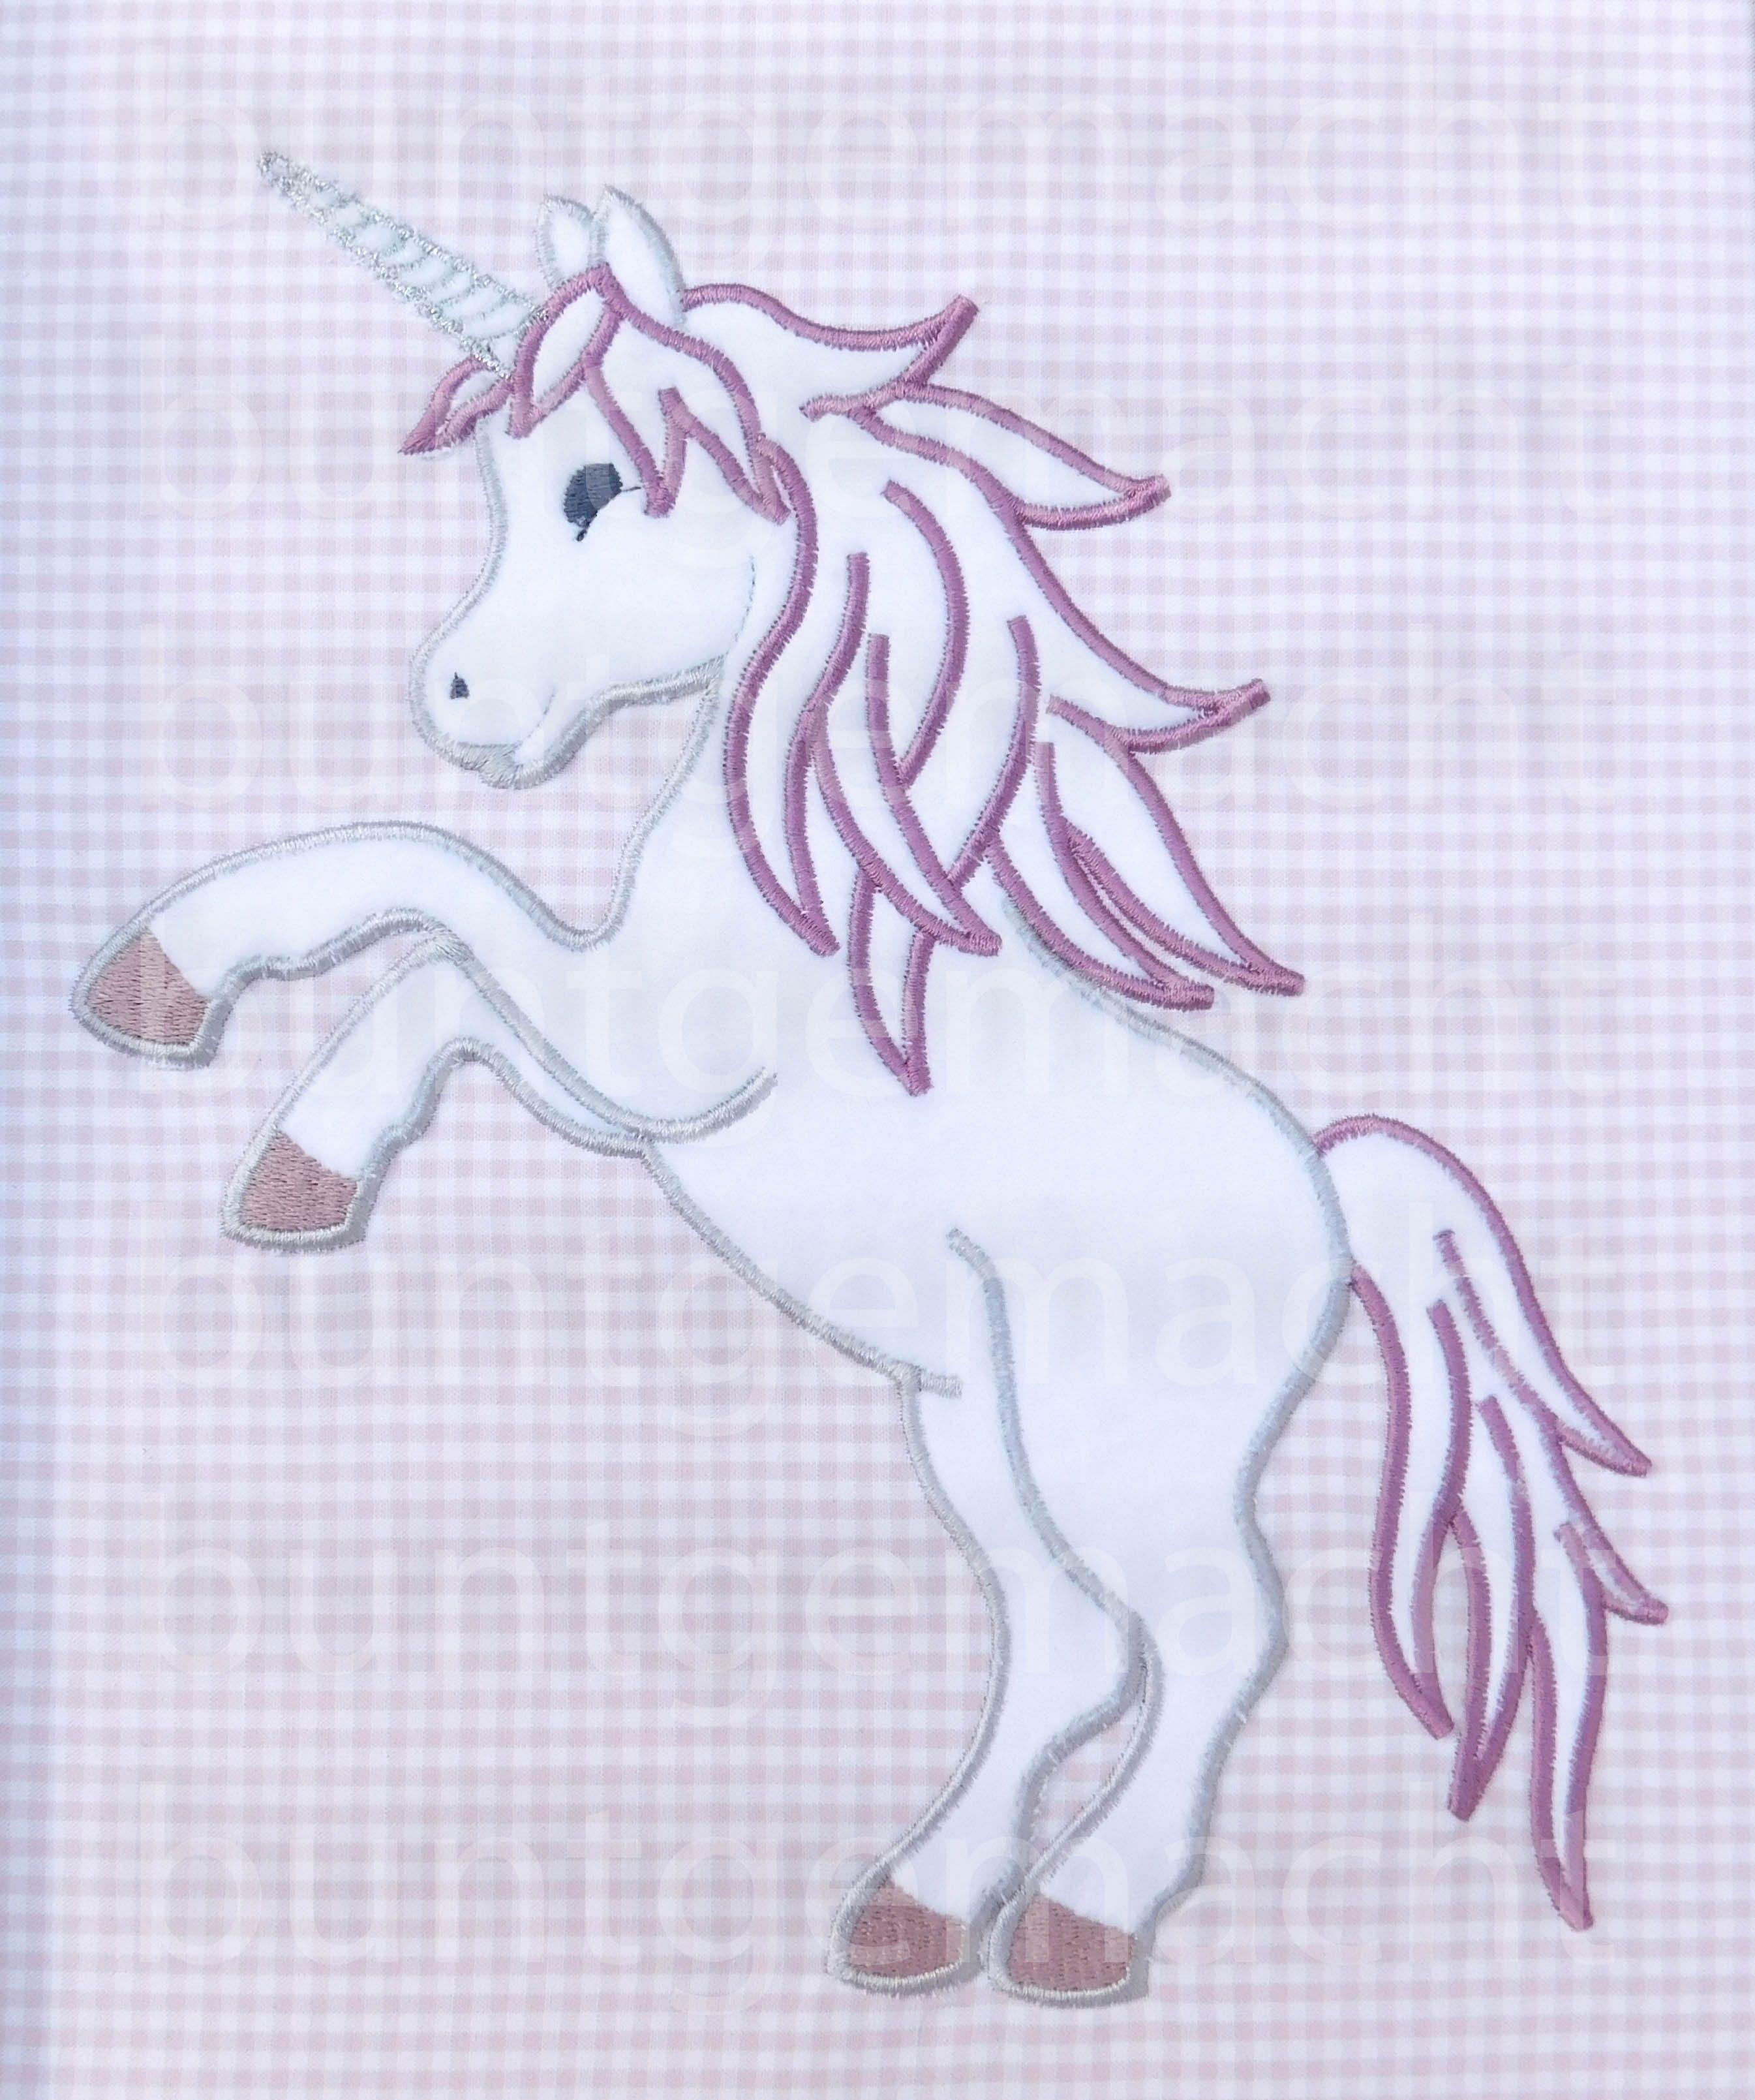 Unicorn Embroidery Design Unicorn Embroidery Applique Instant Download Machine Embroidery File 12 Sizes Embroidery Designs Machine Embroidery Designs Machine Embroidery